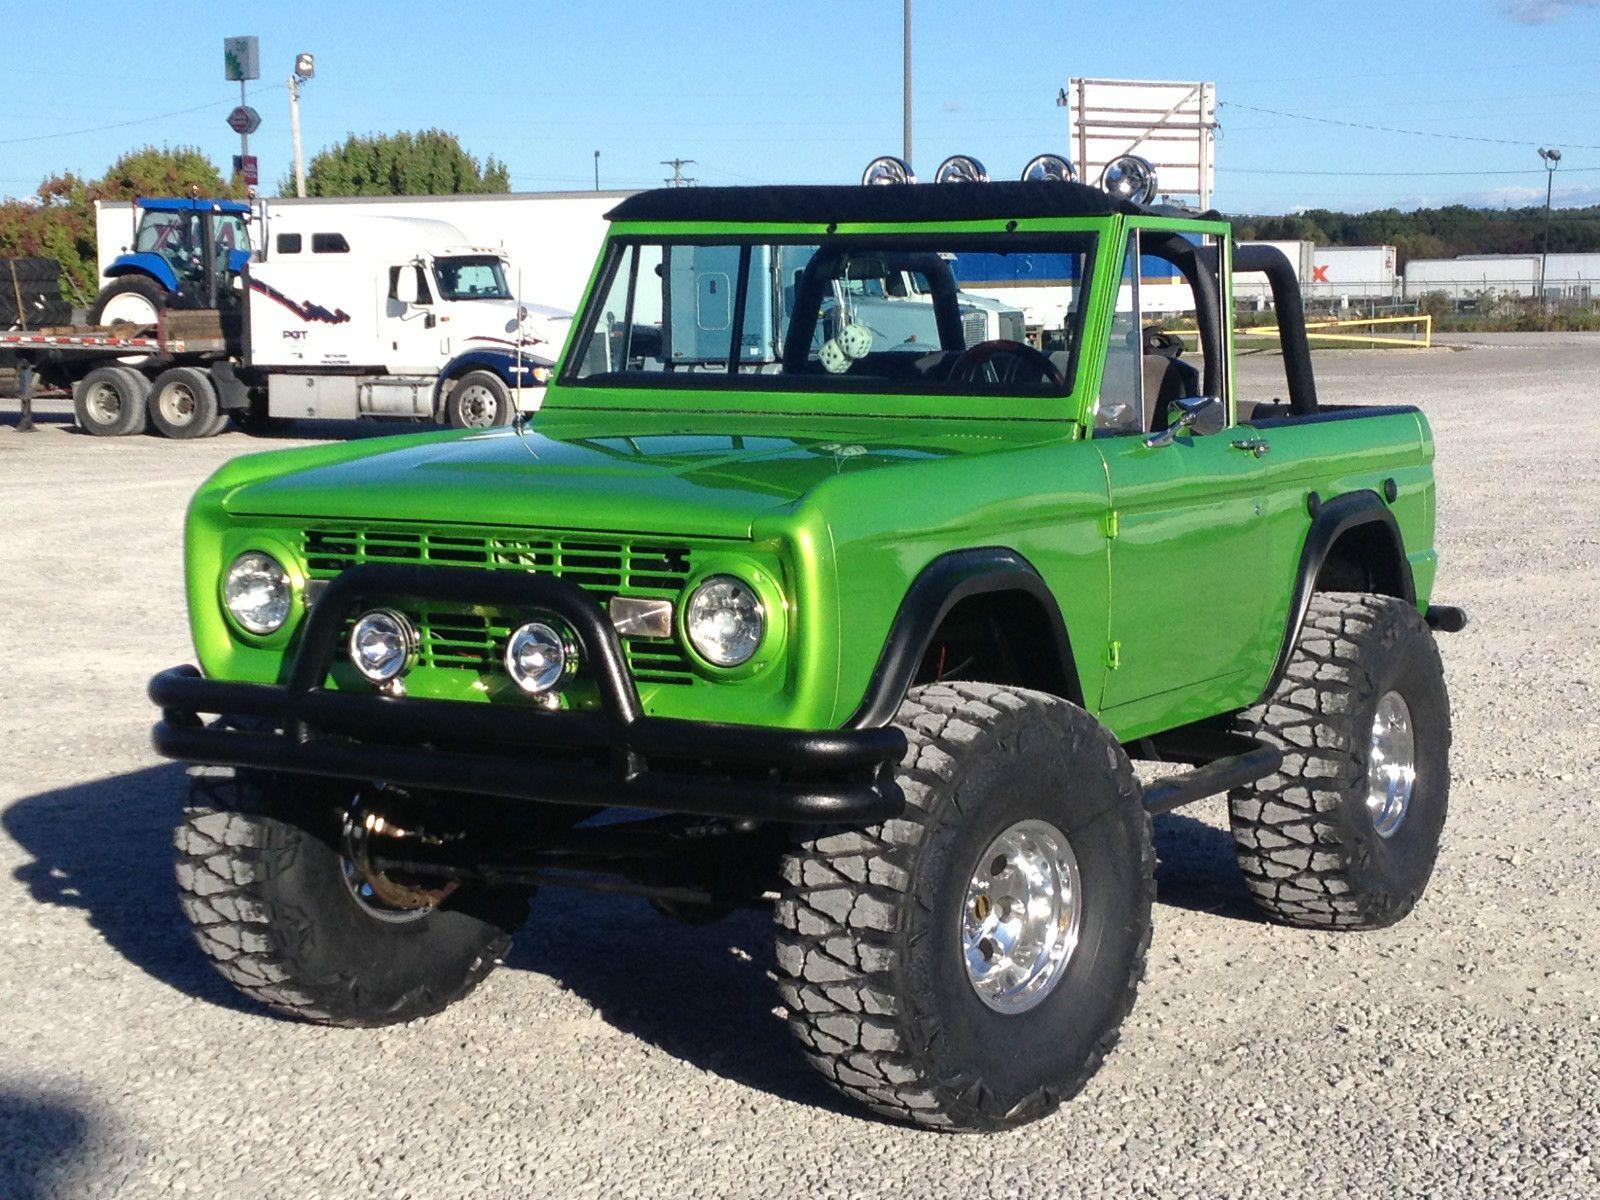 39 69 bronco varooom bronco truck old ford bronco jeep suv. Black Bedroom Furniture Sets. Home Design Ideas